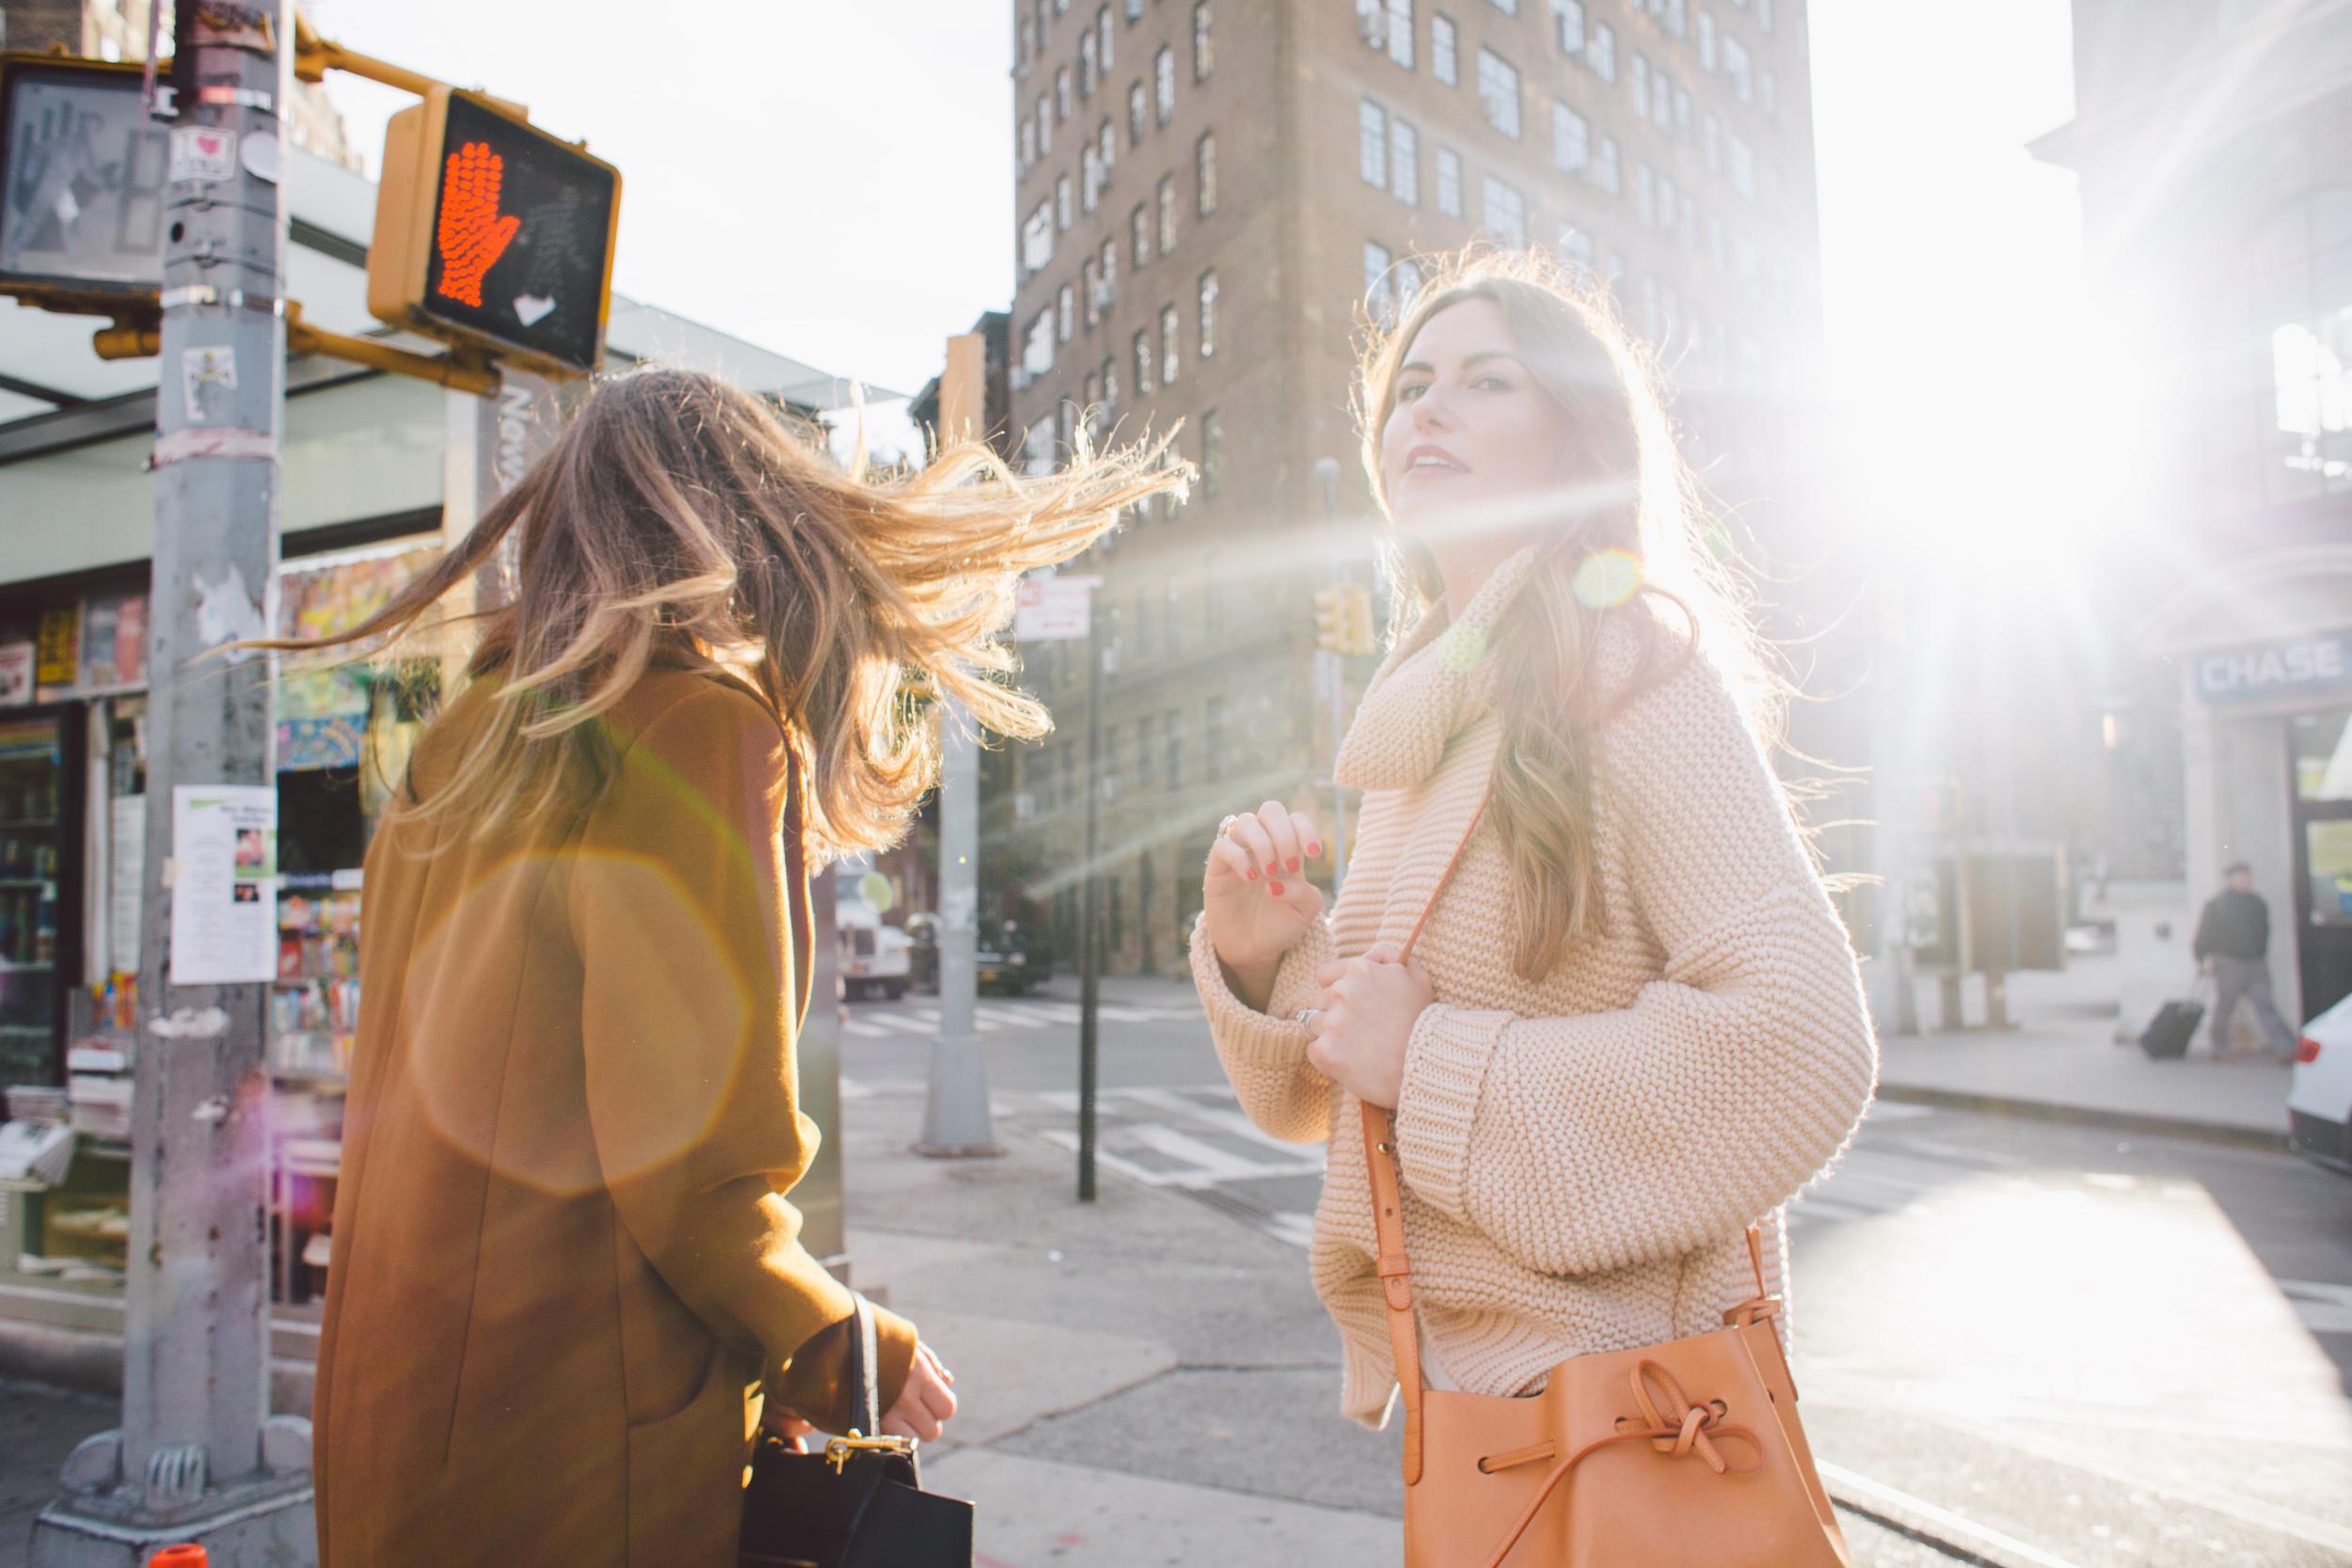 a pair of women wait at a new york city crosswalk. (credit: moyo oyelola)